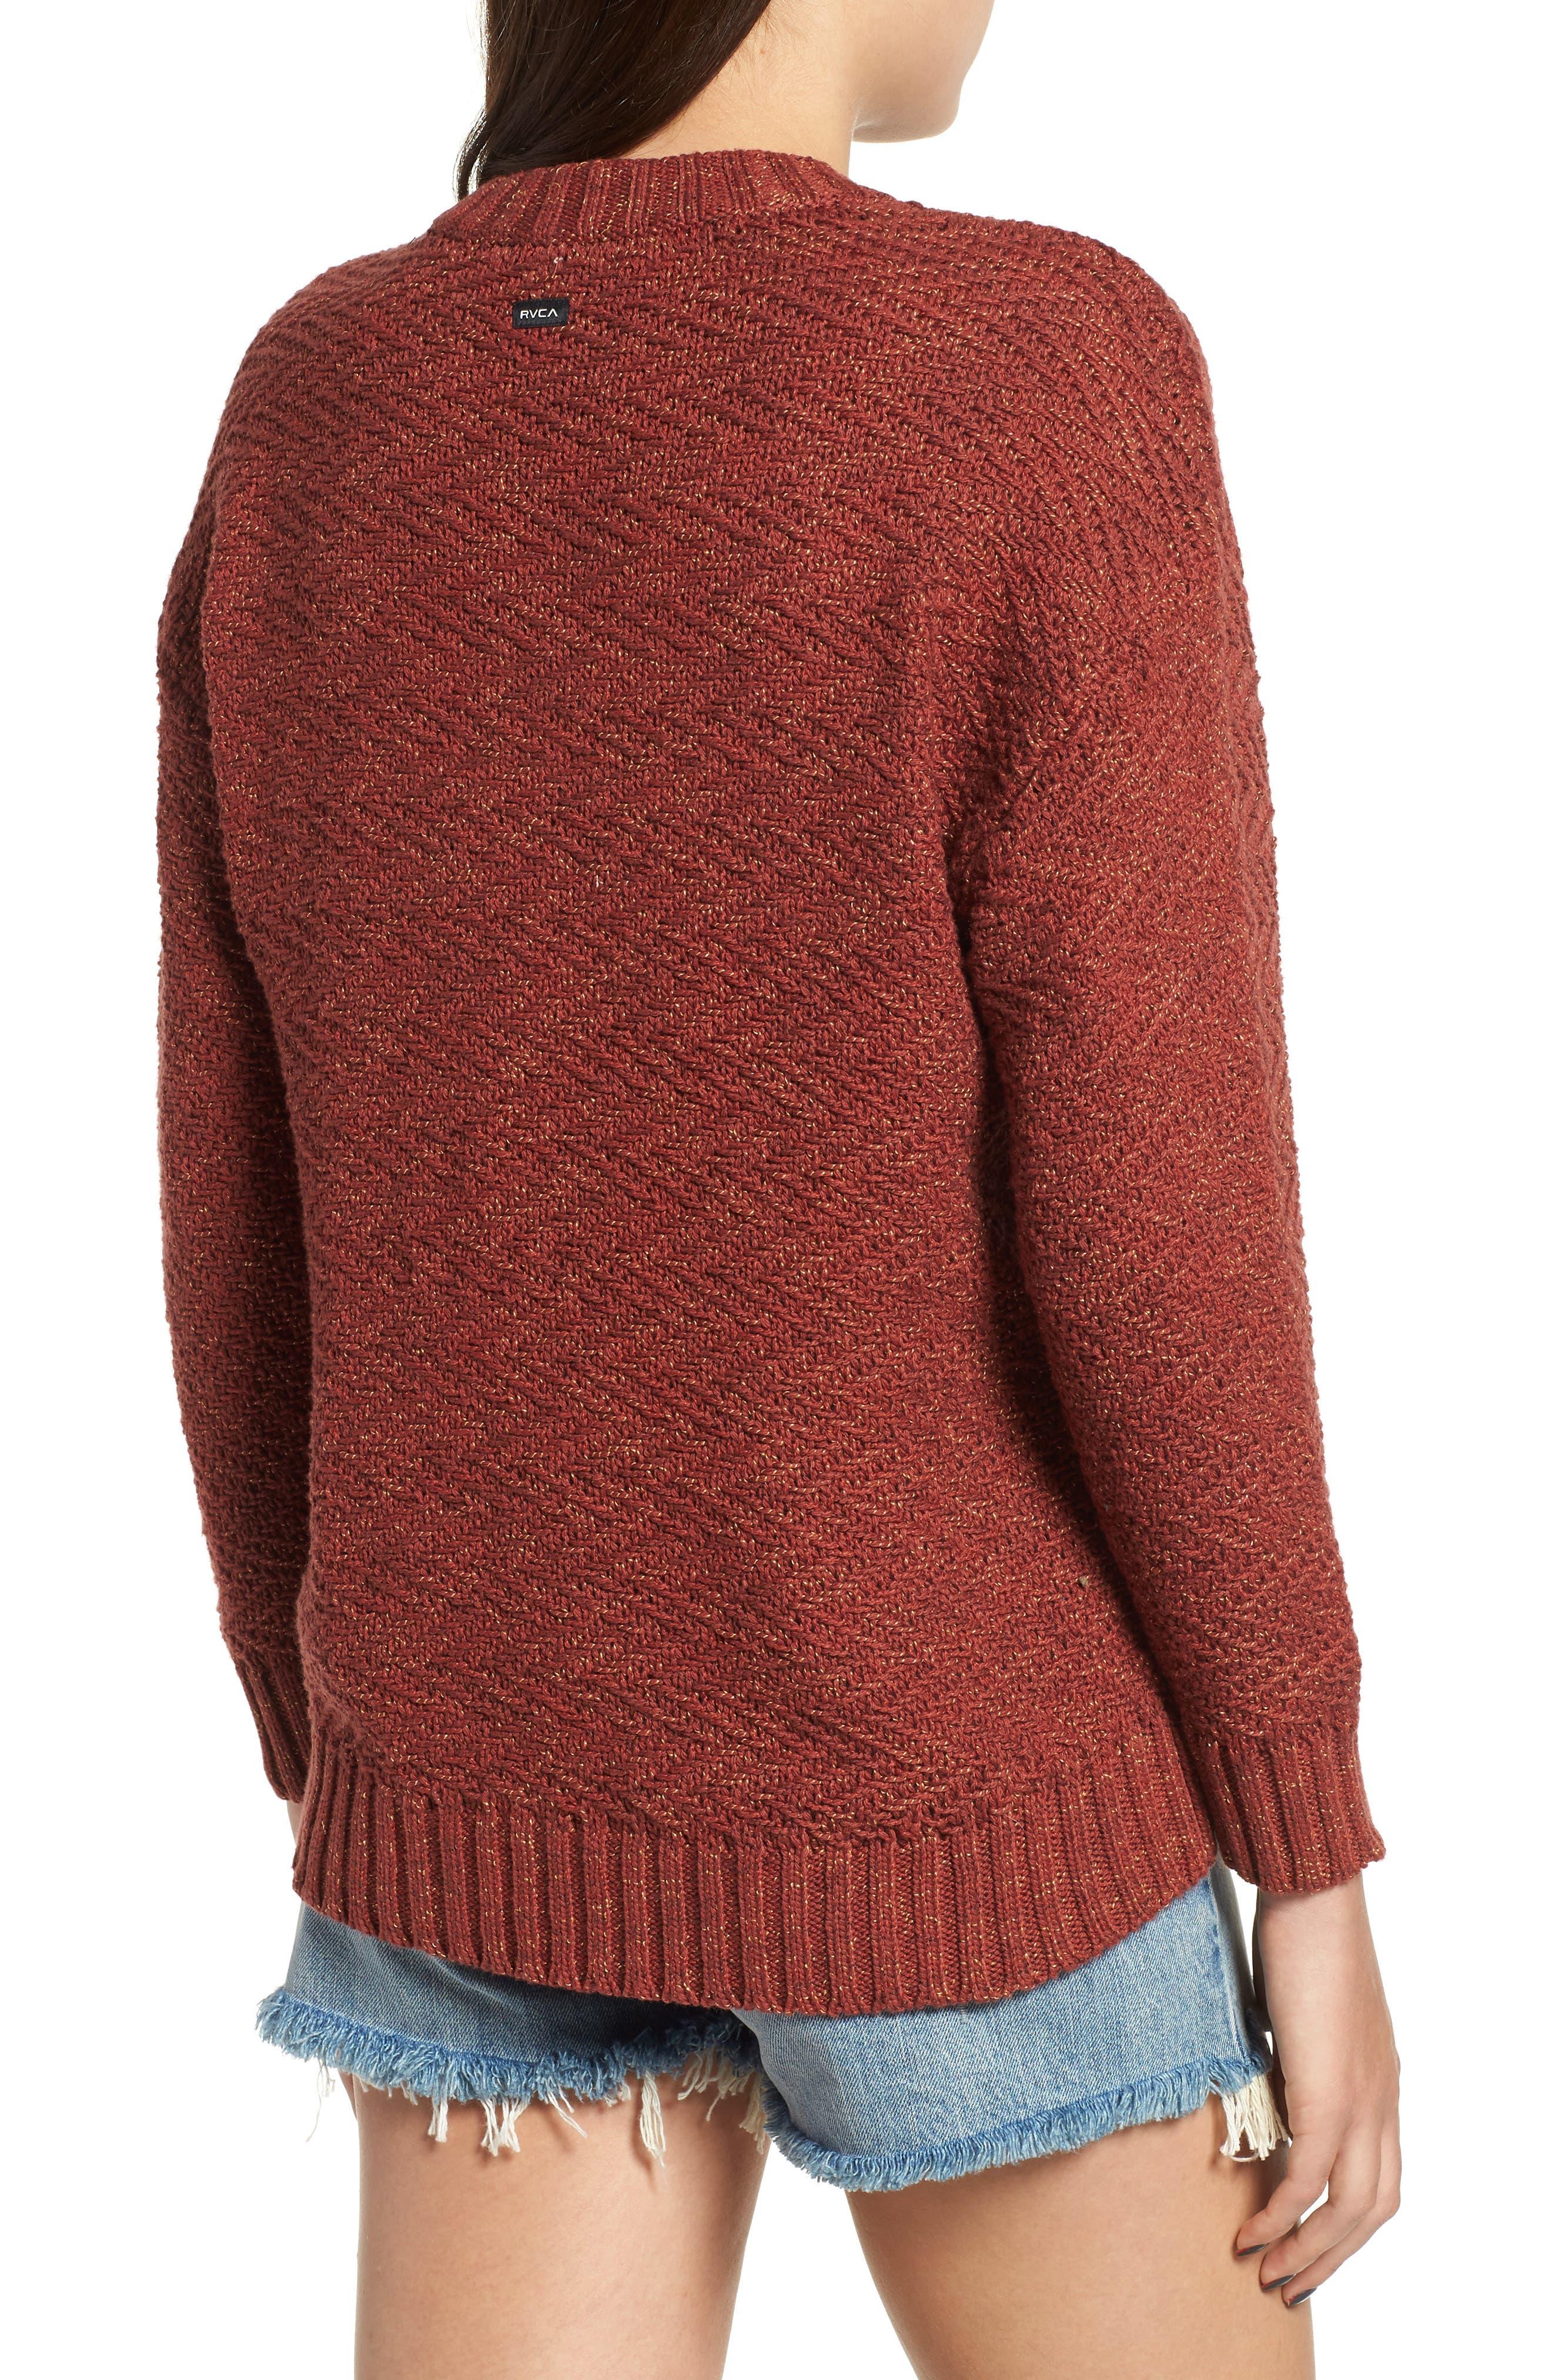 Zigged Sweater,                             Alternate thumbnail 2, color,                             HENNA